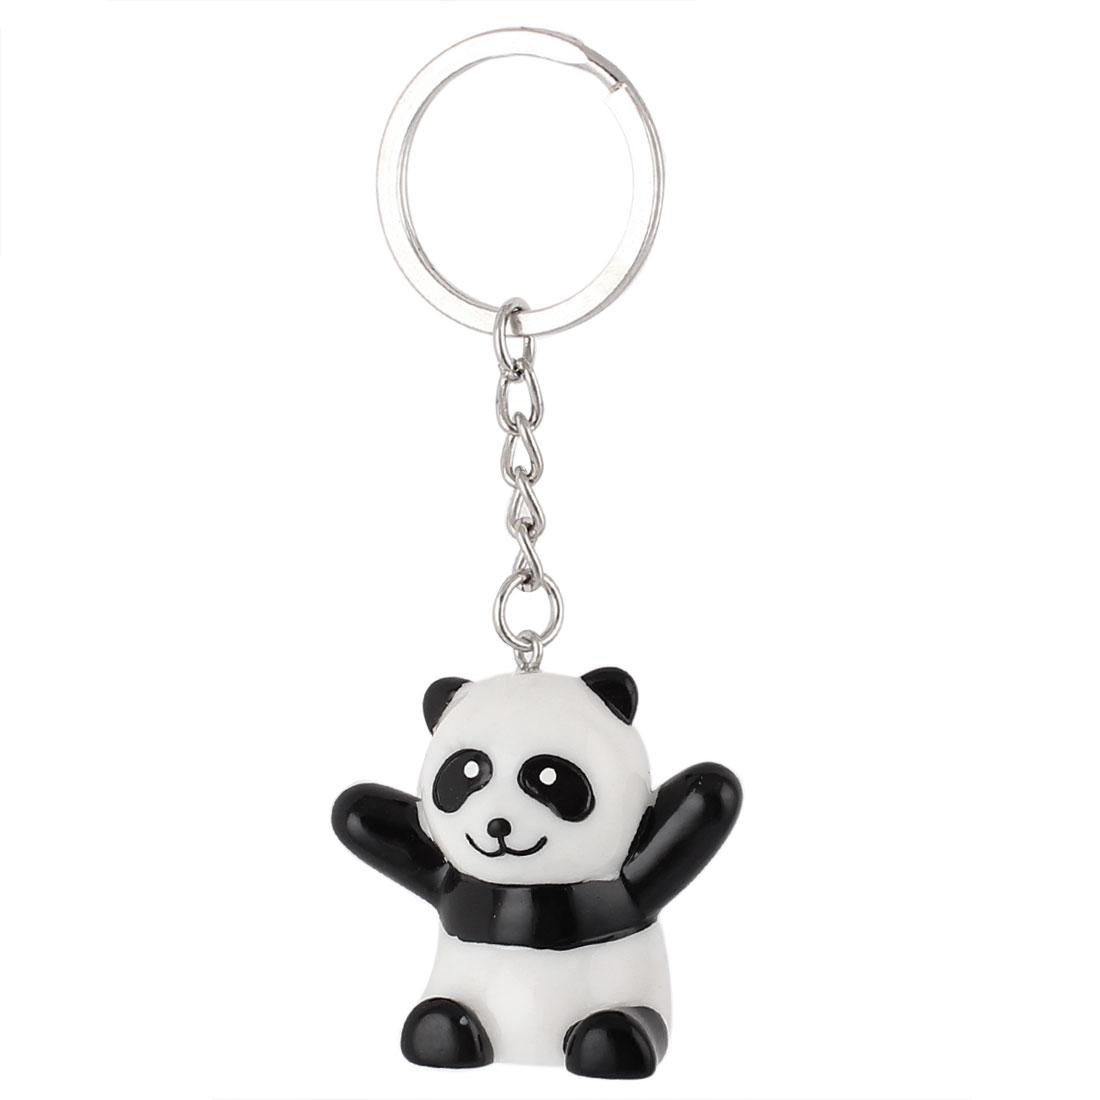 Chubby Panda Cell Phone Bag Strap Pendant Ornament